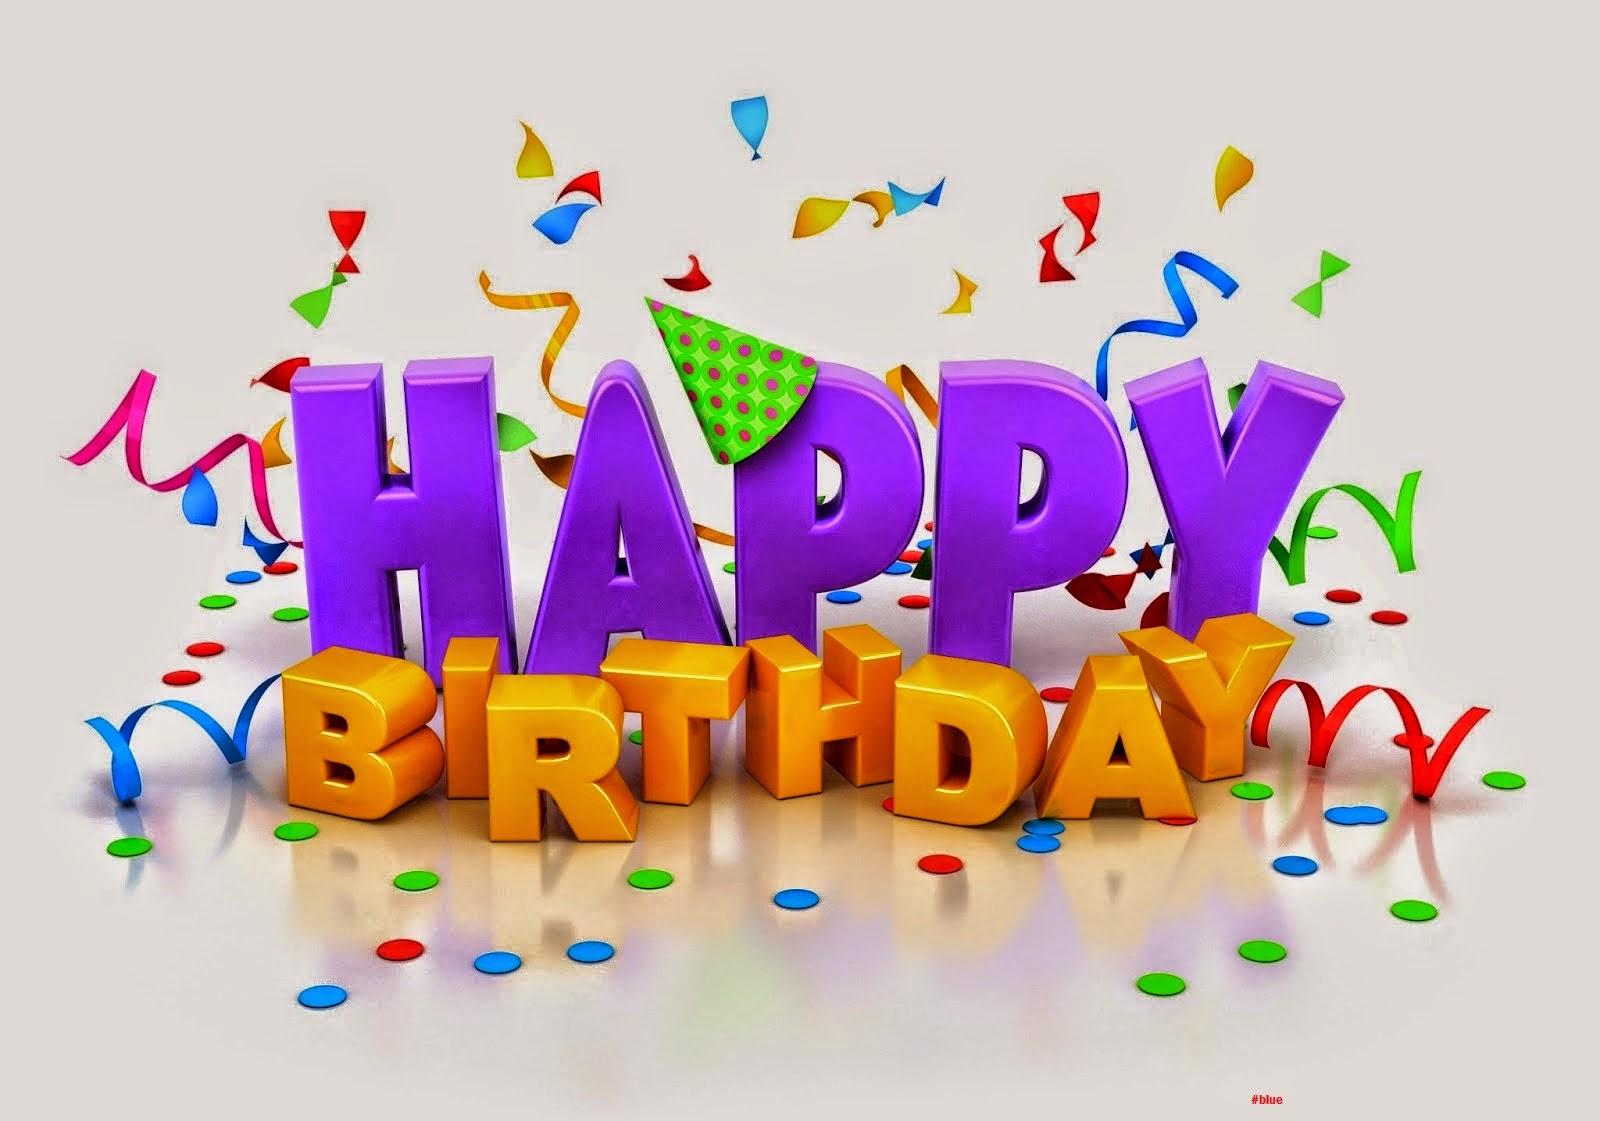 Free On Line Birthday Cards gangcraftnet